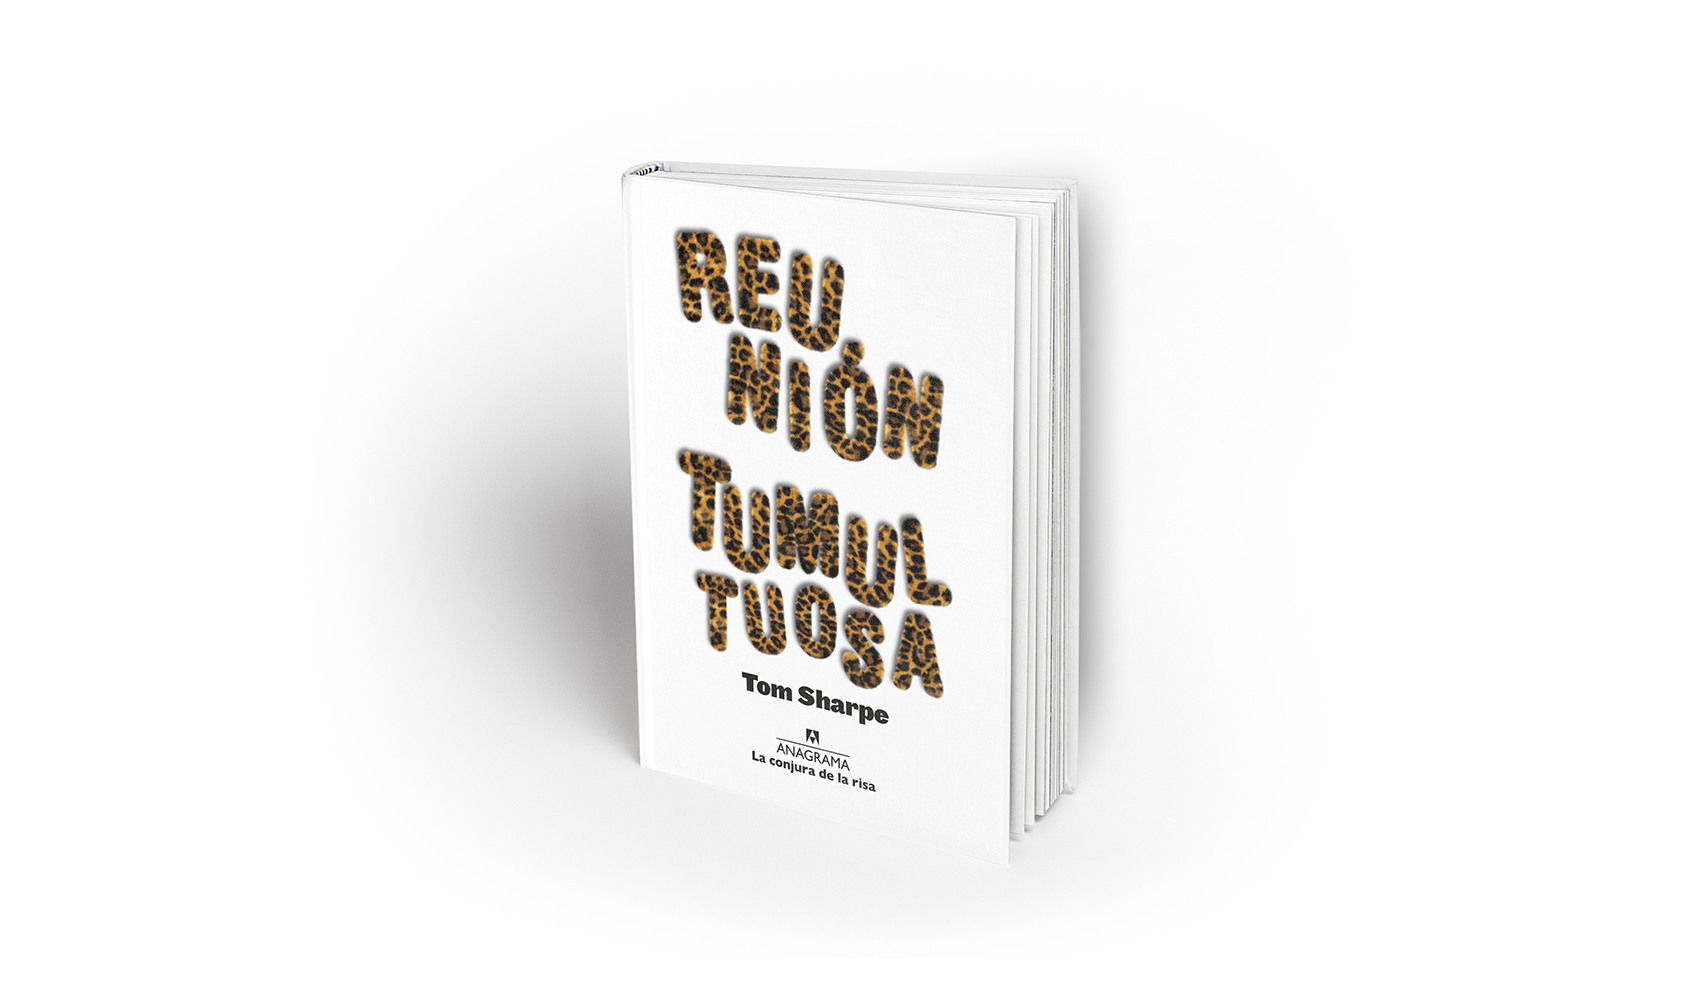 portada_libro_reunion_tumultuosa